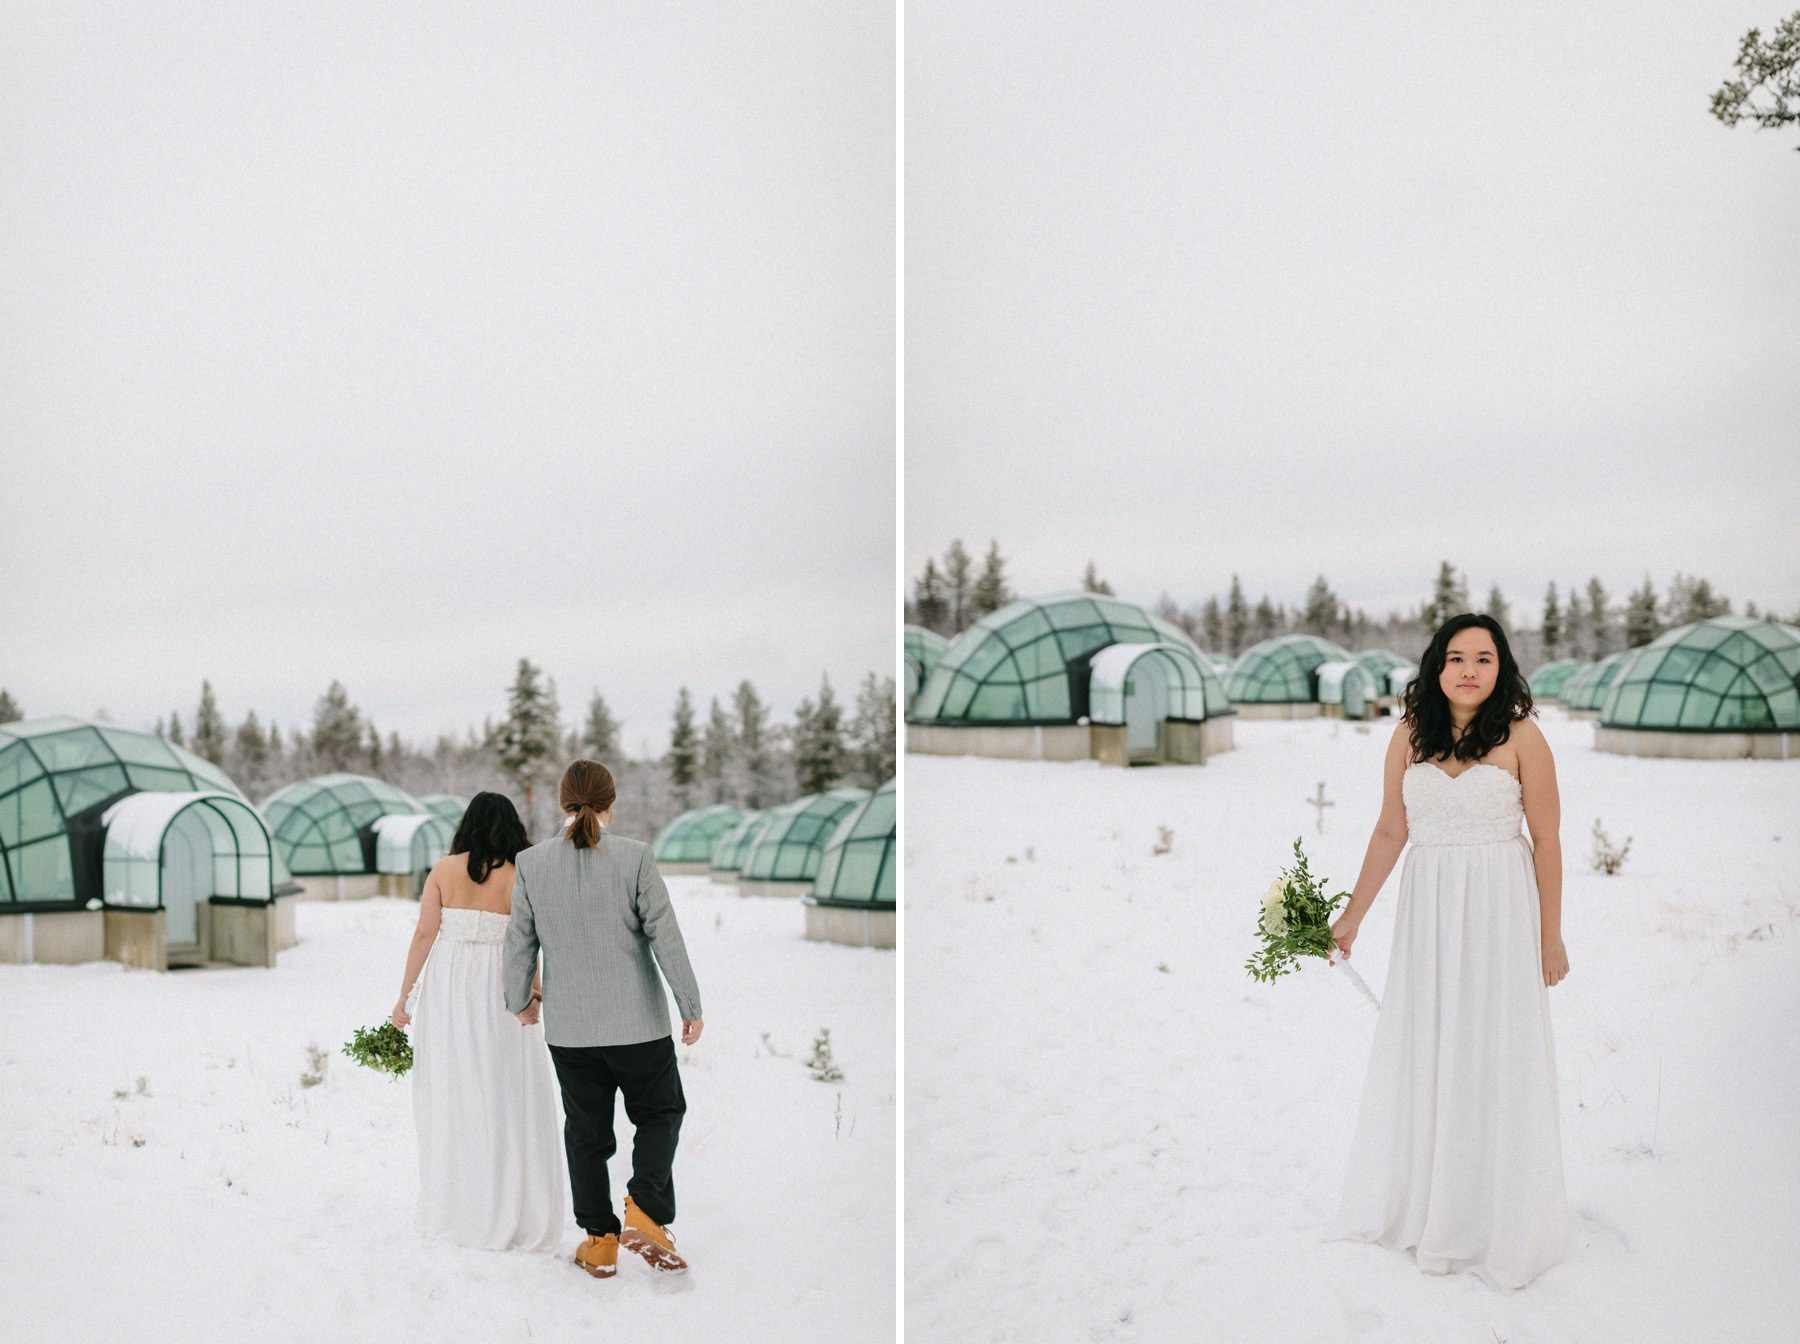 Lapland igloo hotel